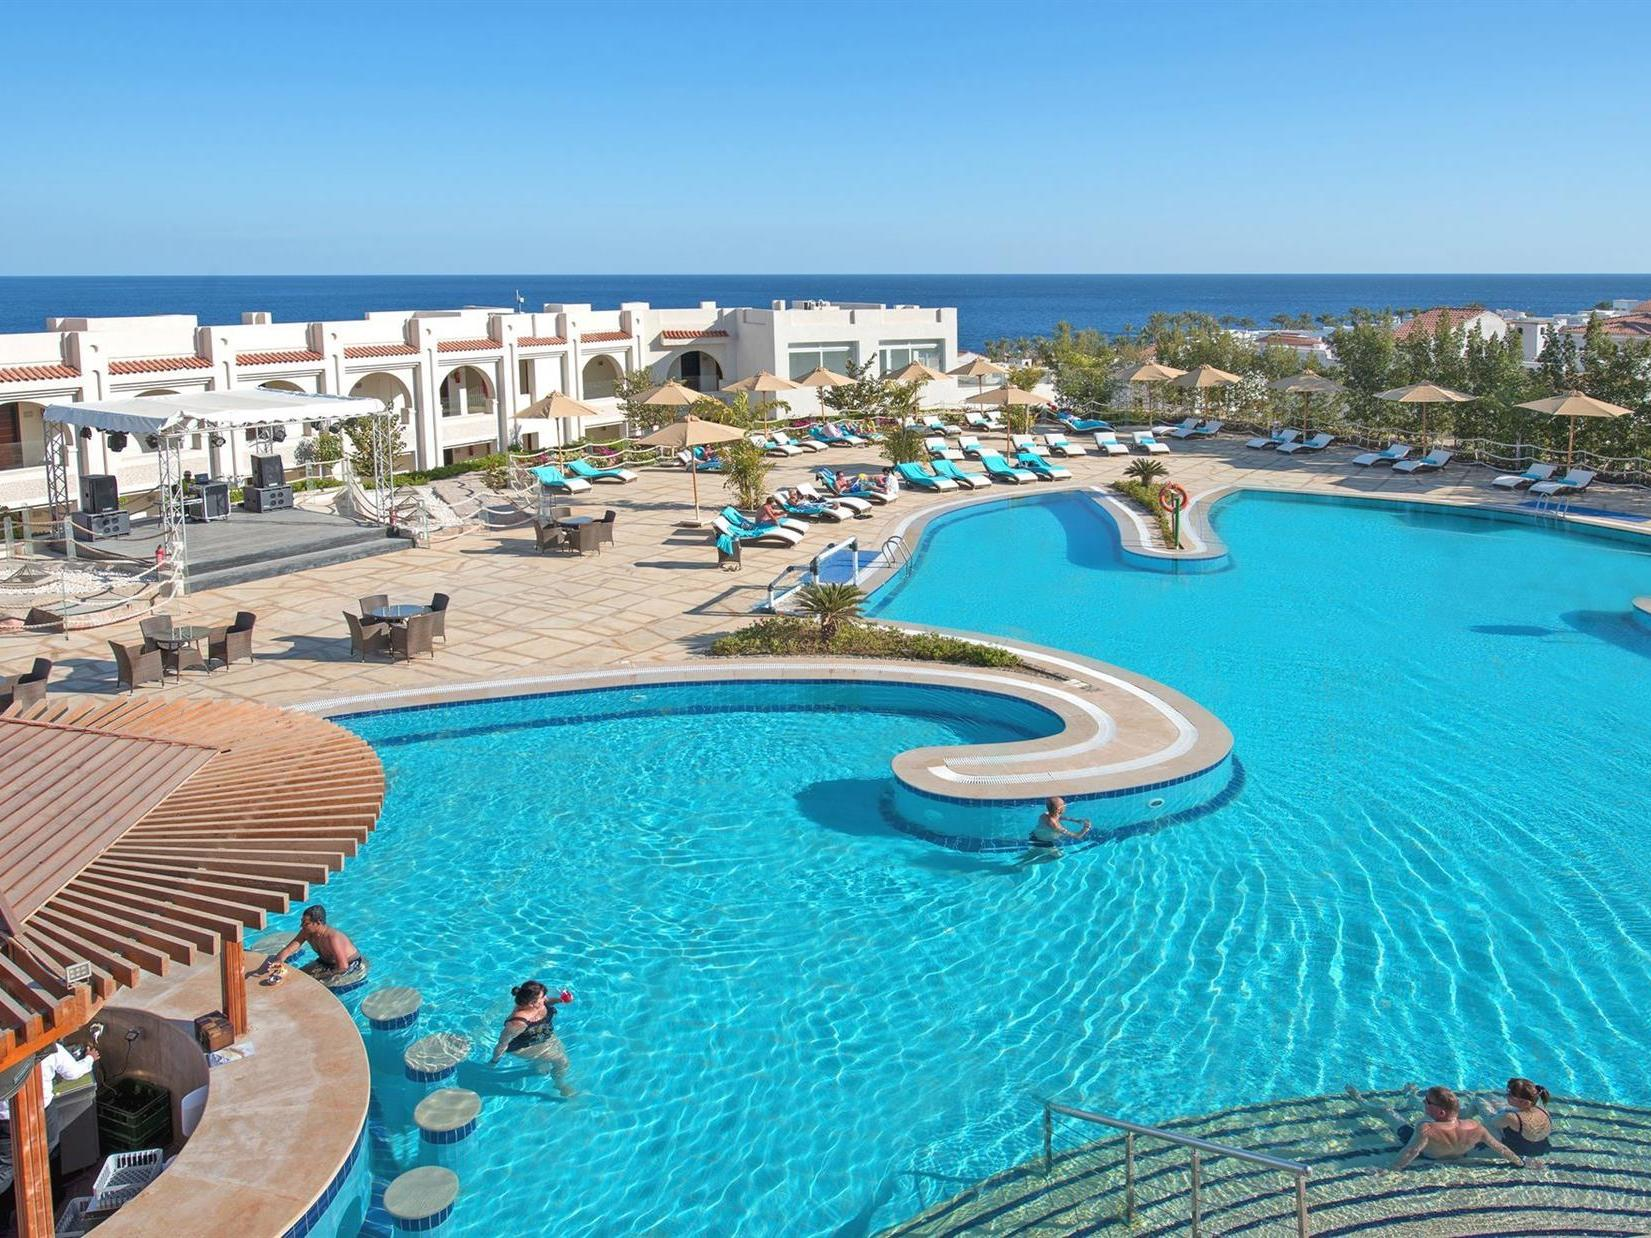 Sunrise Montemare Resort 5 *, Шарм Эль Шейх